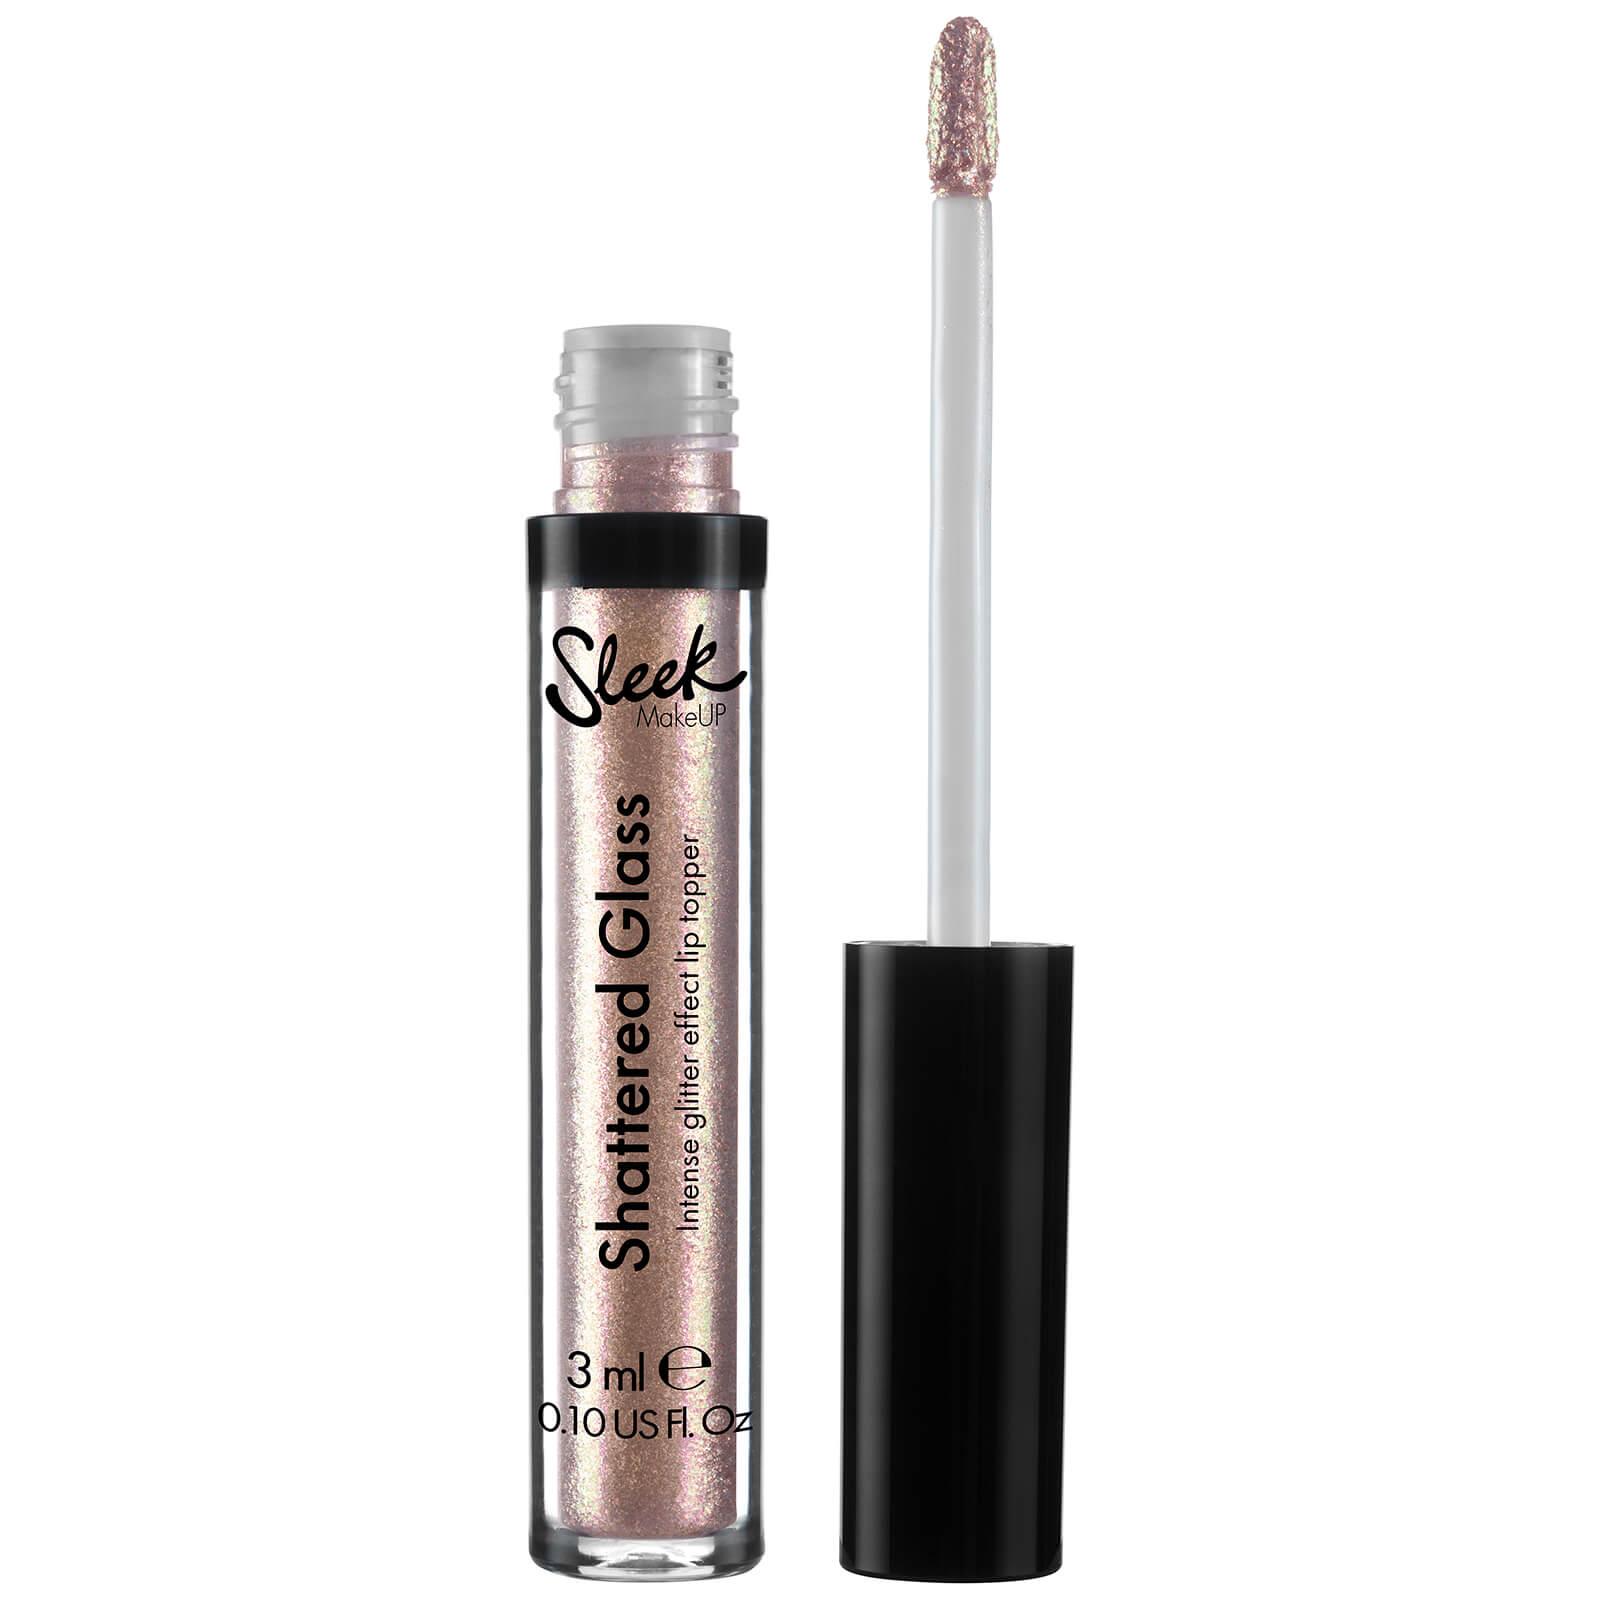 Купить Sleek MakeUP Shattered Glass Lip Topper 3ml (Various Shades) - Bad Moon